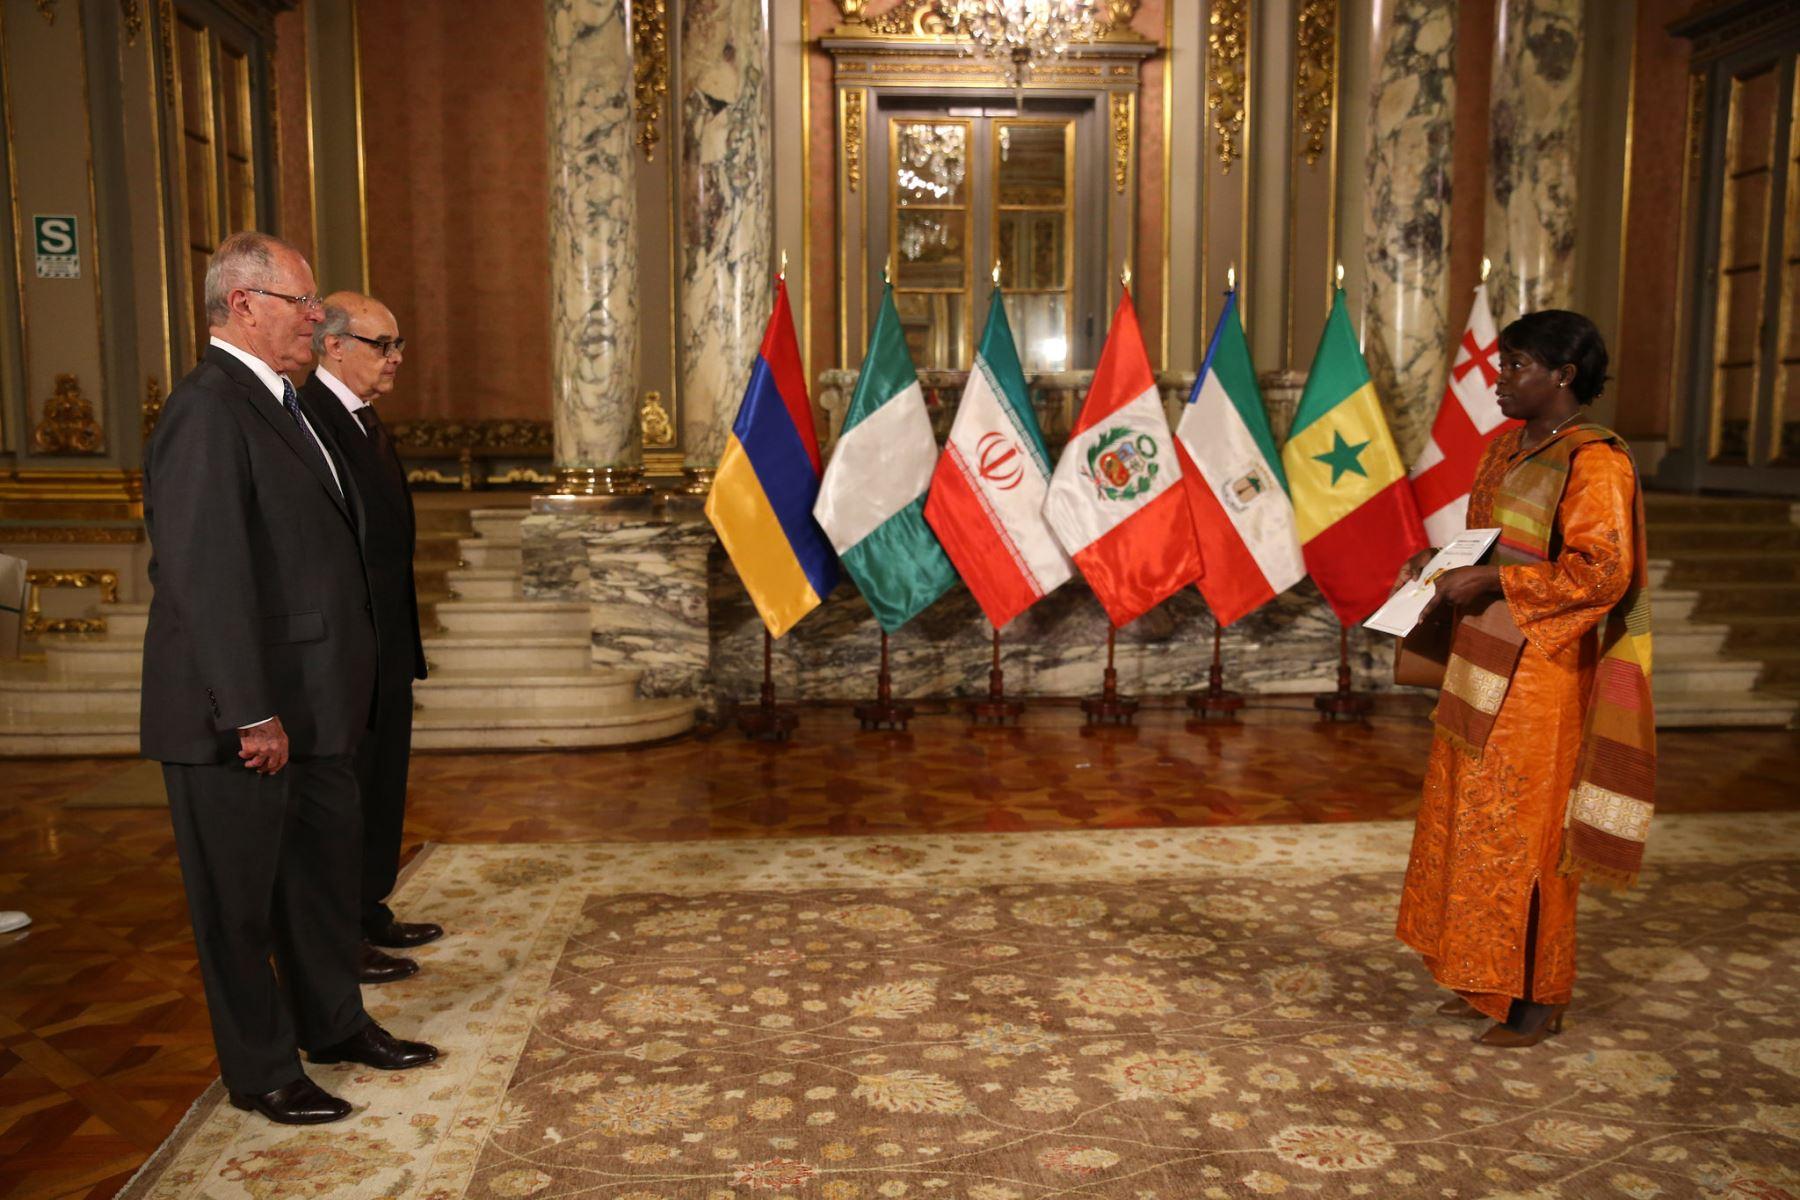 Presidente Kuczynski recibe cartas credenciales de seis embajadores concurrentes. Foto: ANDINA/Prensa Presidencia